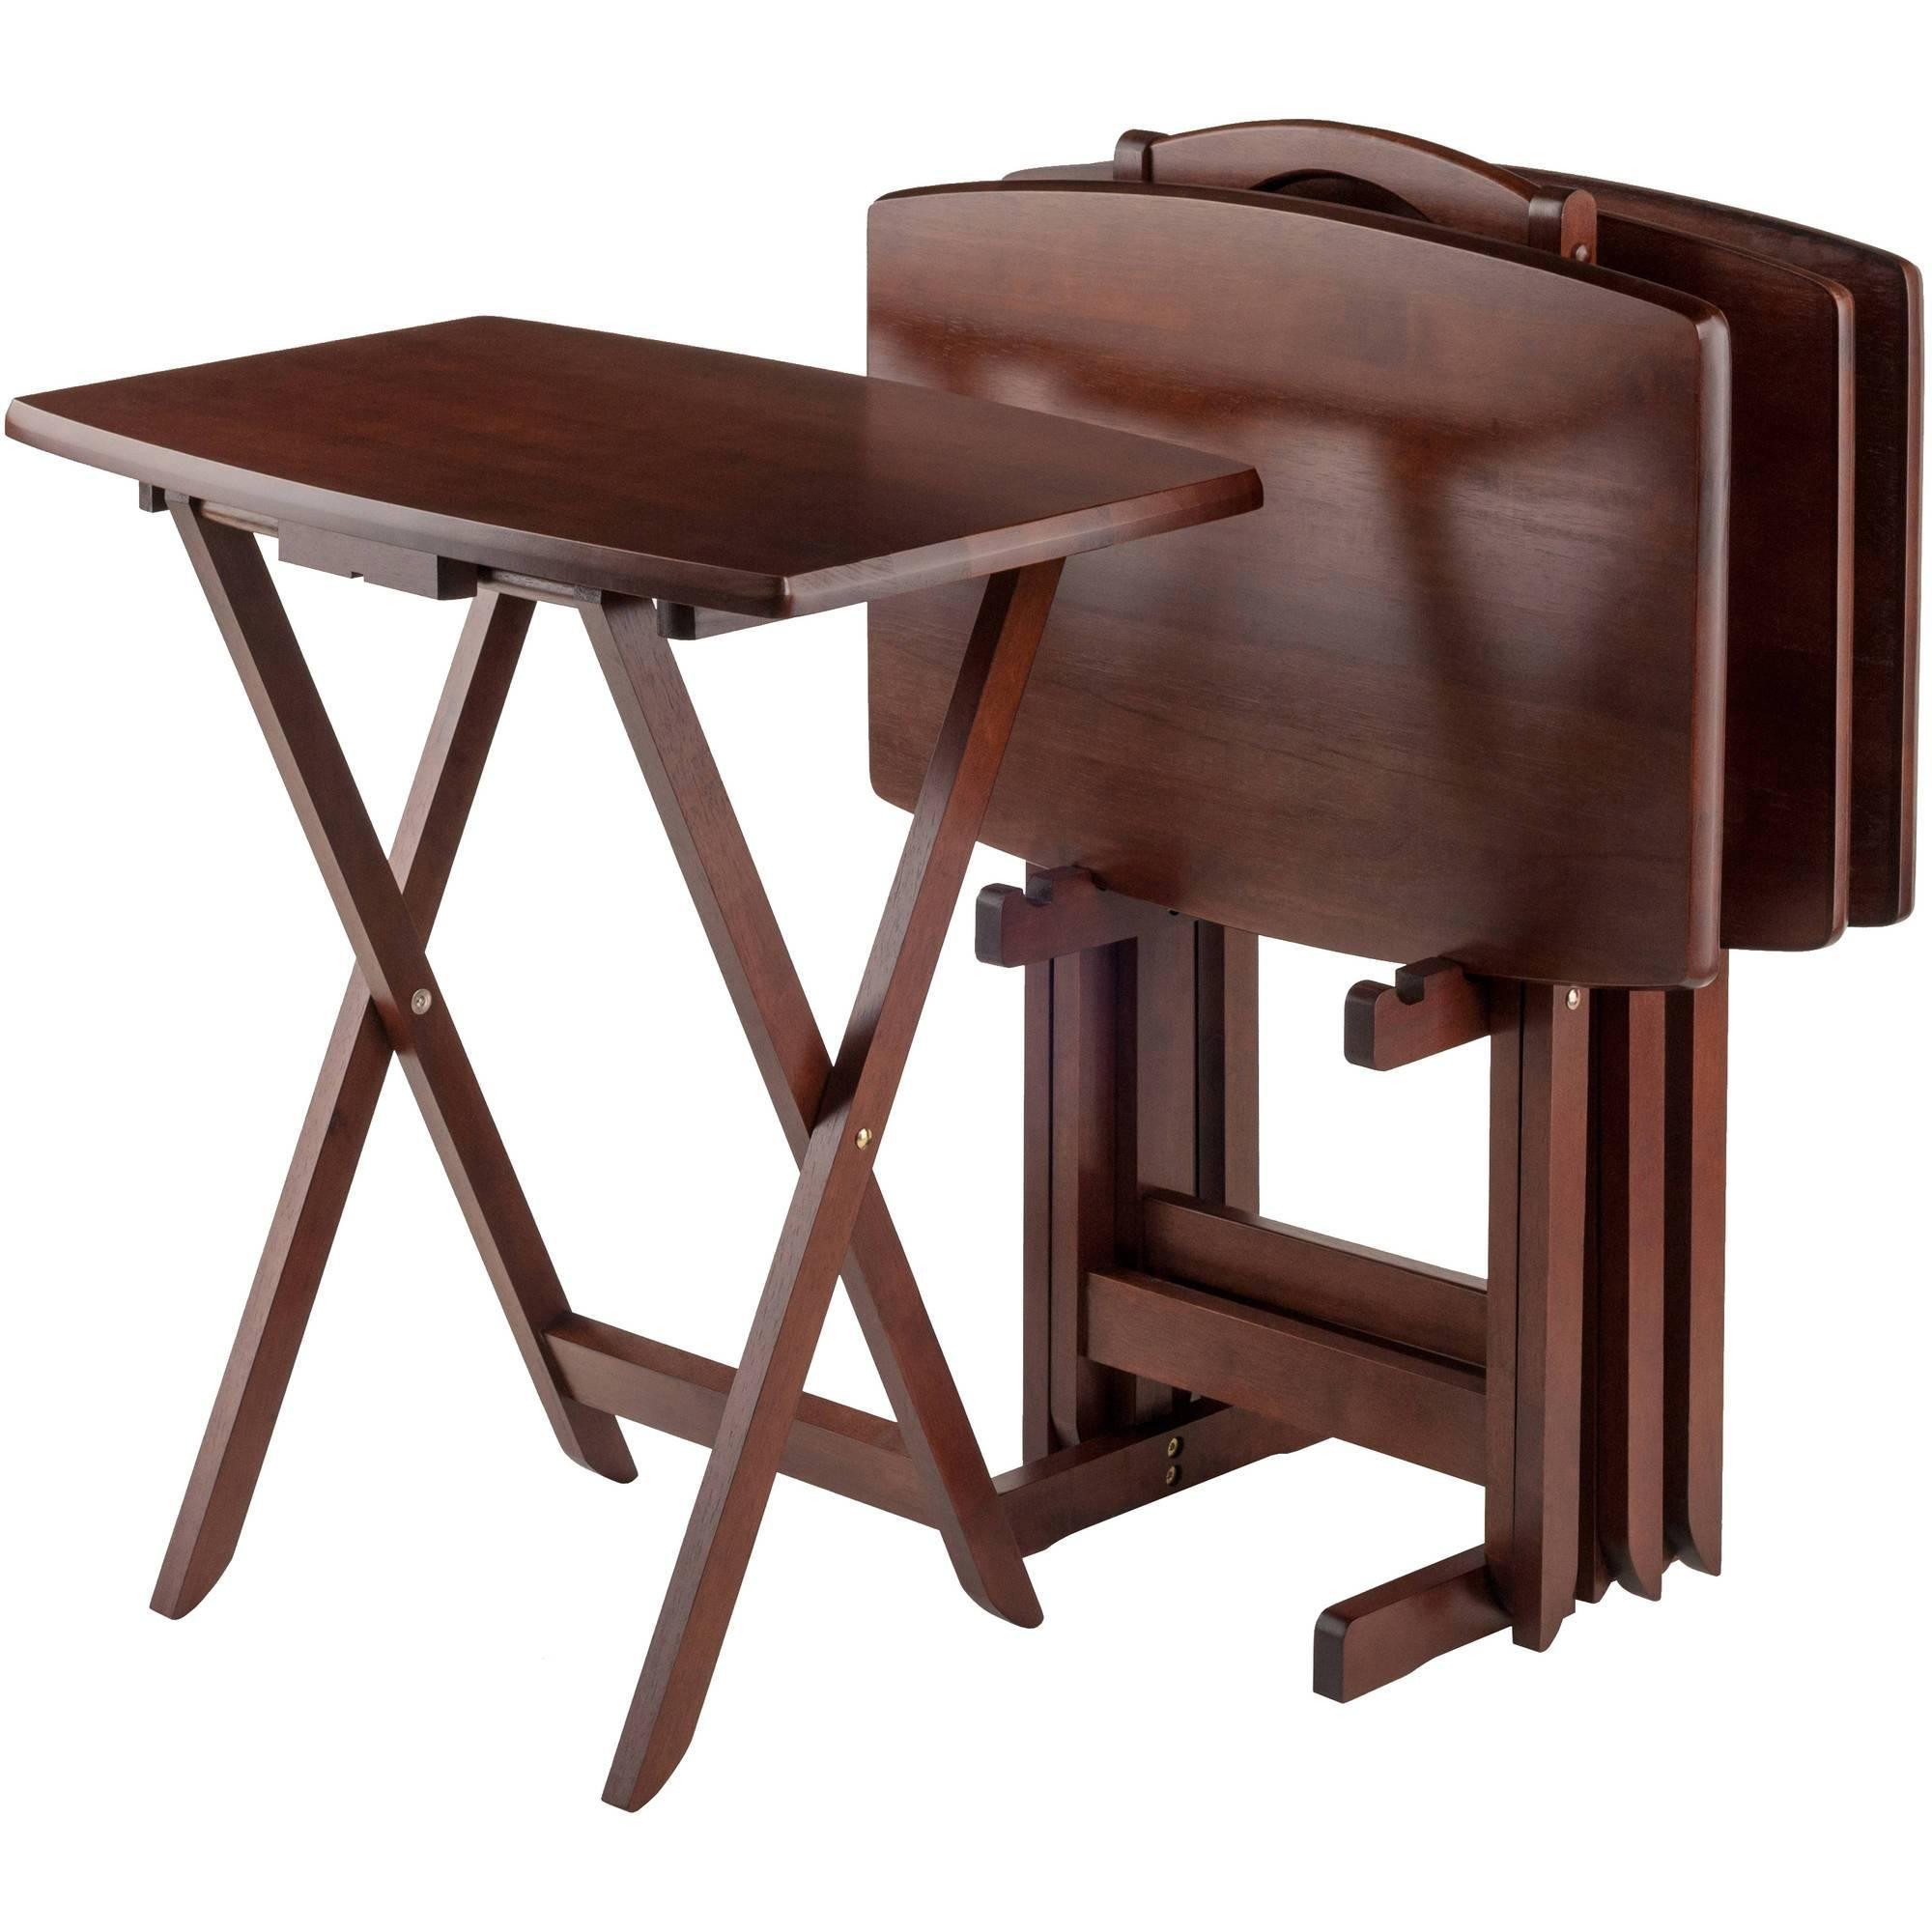 Mainstays Tray Table, Walnut - Walmart for Sofa Snack Tray Table (Image 10 of 30)